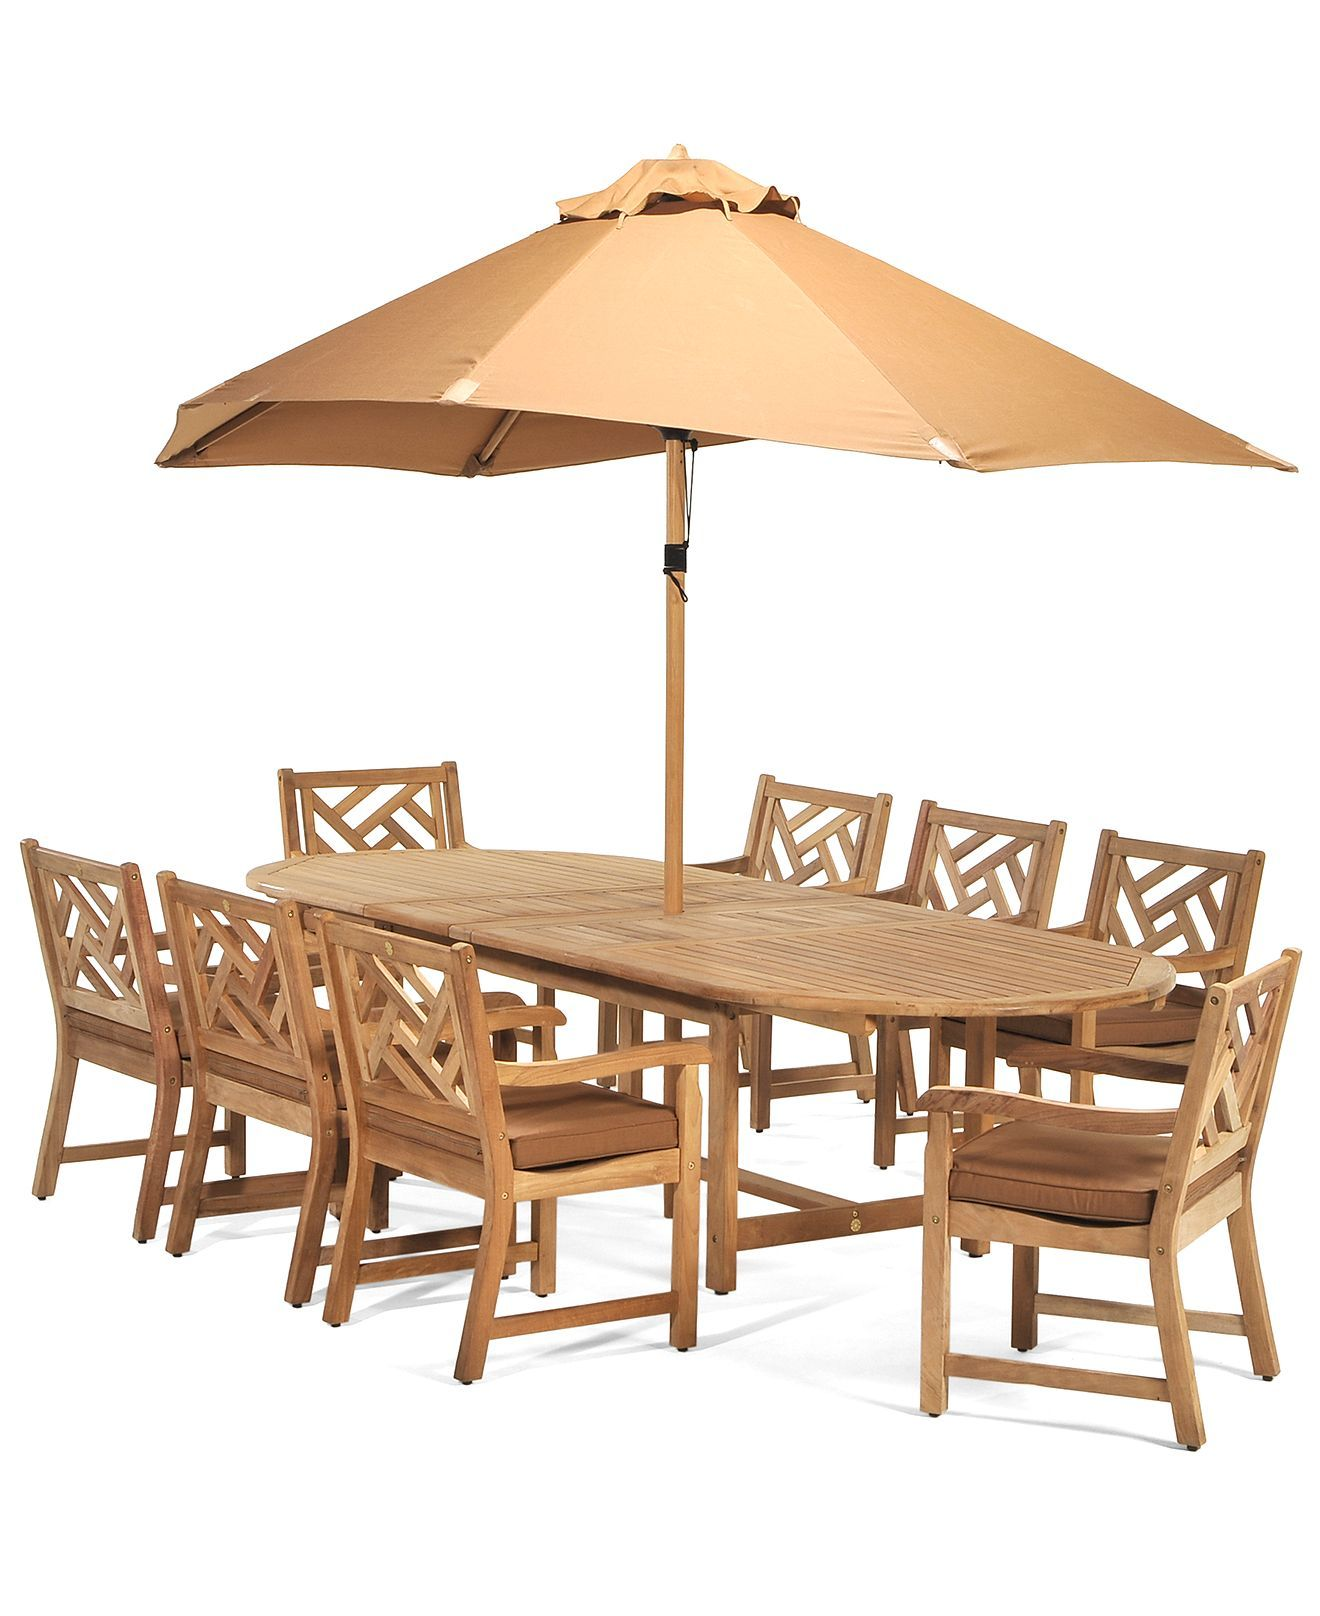 $1849 Haywood Teak Outdoor Patio Furniture 9 Piece Dining Set